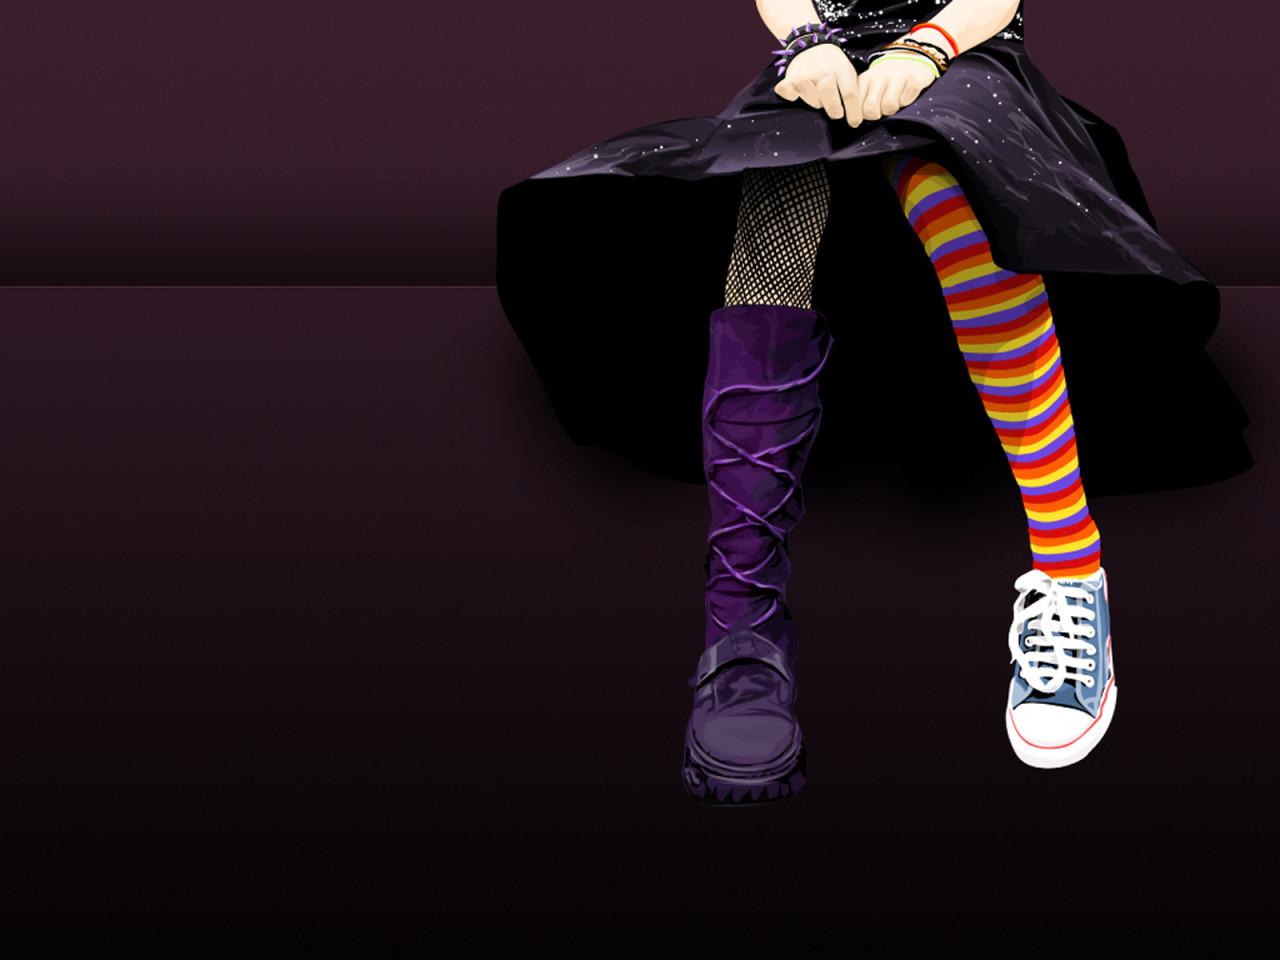 http://3.bp.blogspot.com/-c6SAIKxduDs/UEoCKgBXEUI/AAAAAAAAAmI/dW1tuHqX7OI/s1600/Anime+Emo+Wallpapers+%285%29.jpg